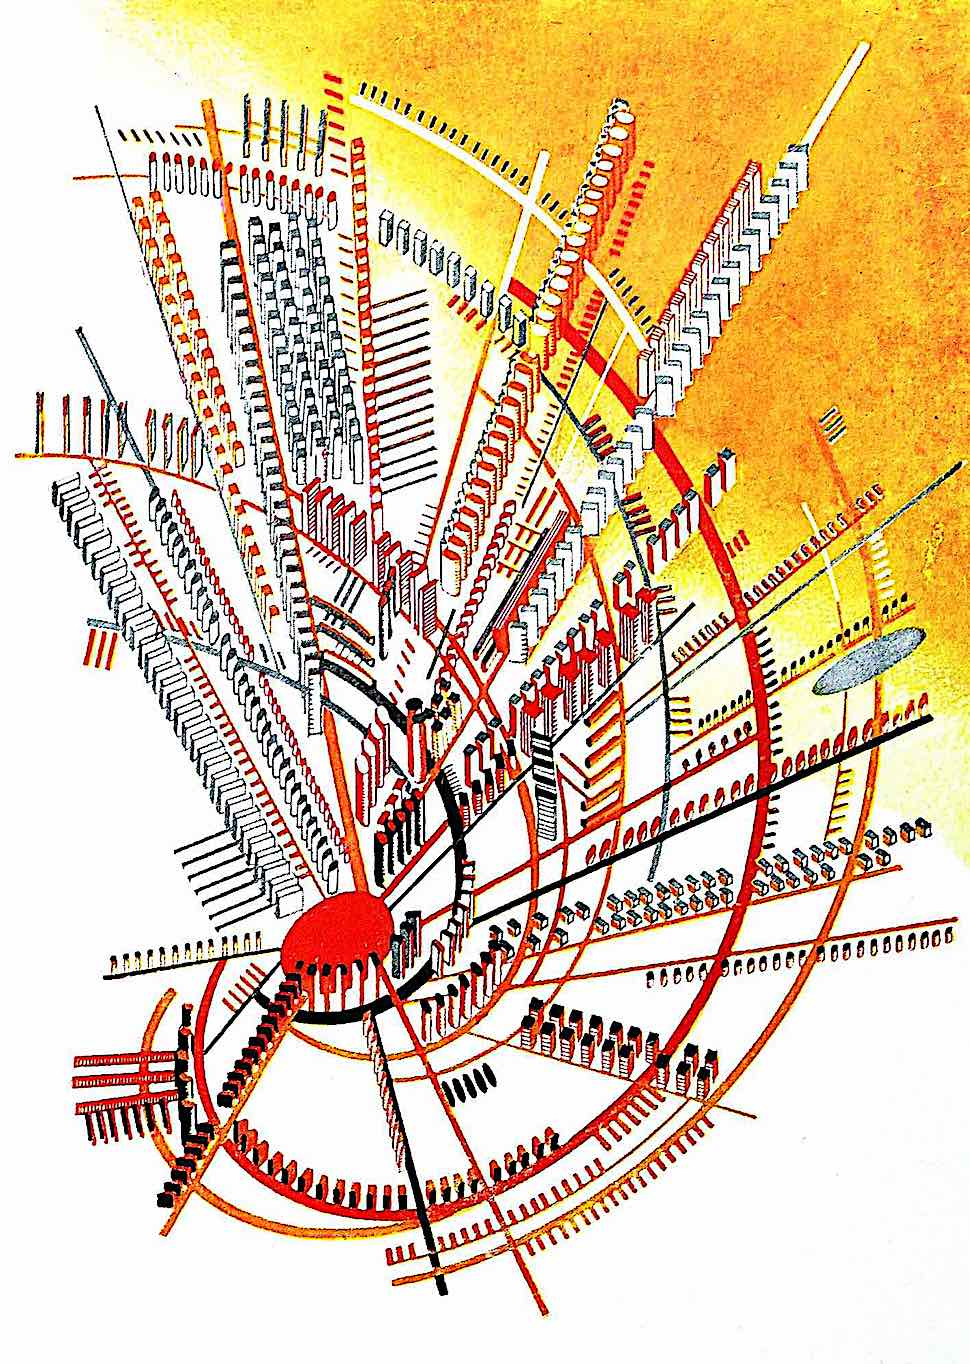 an Iakov Chernikhov constructivism concept